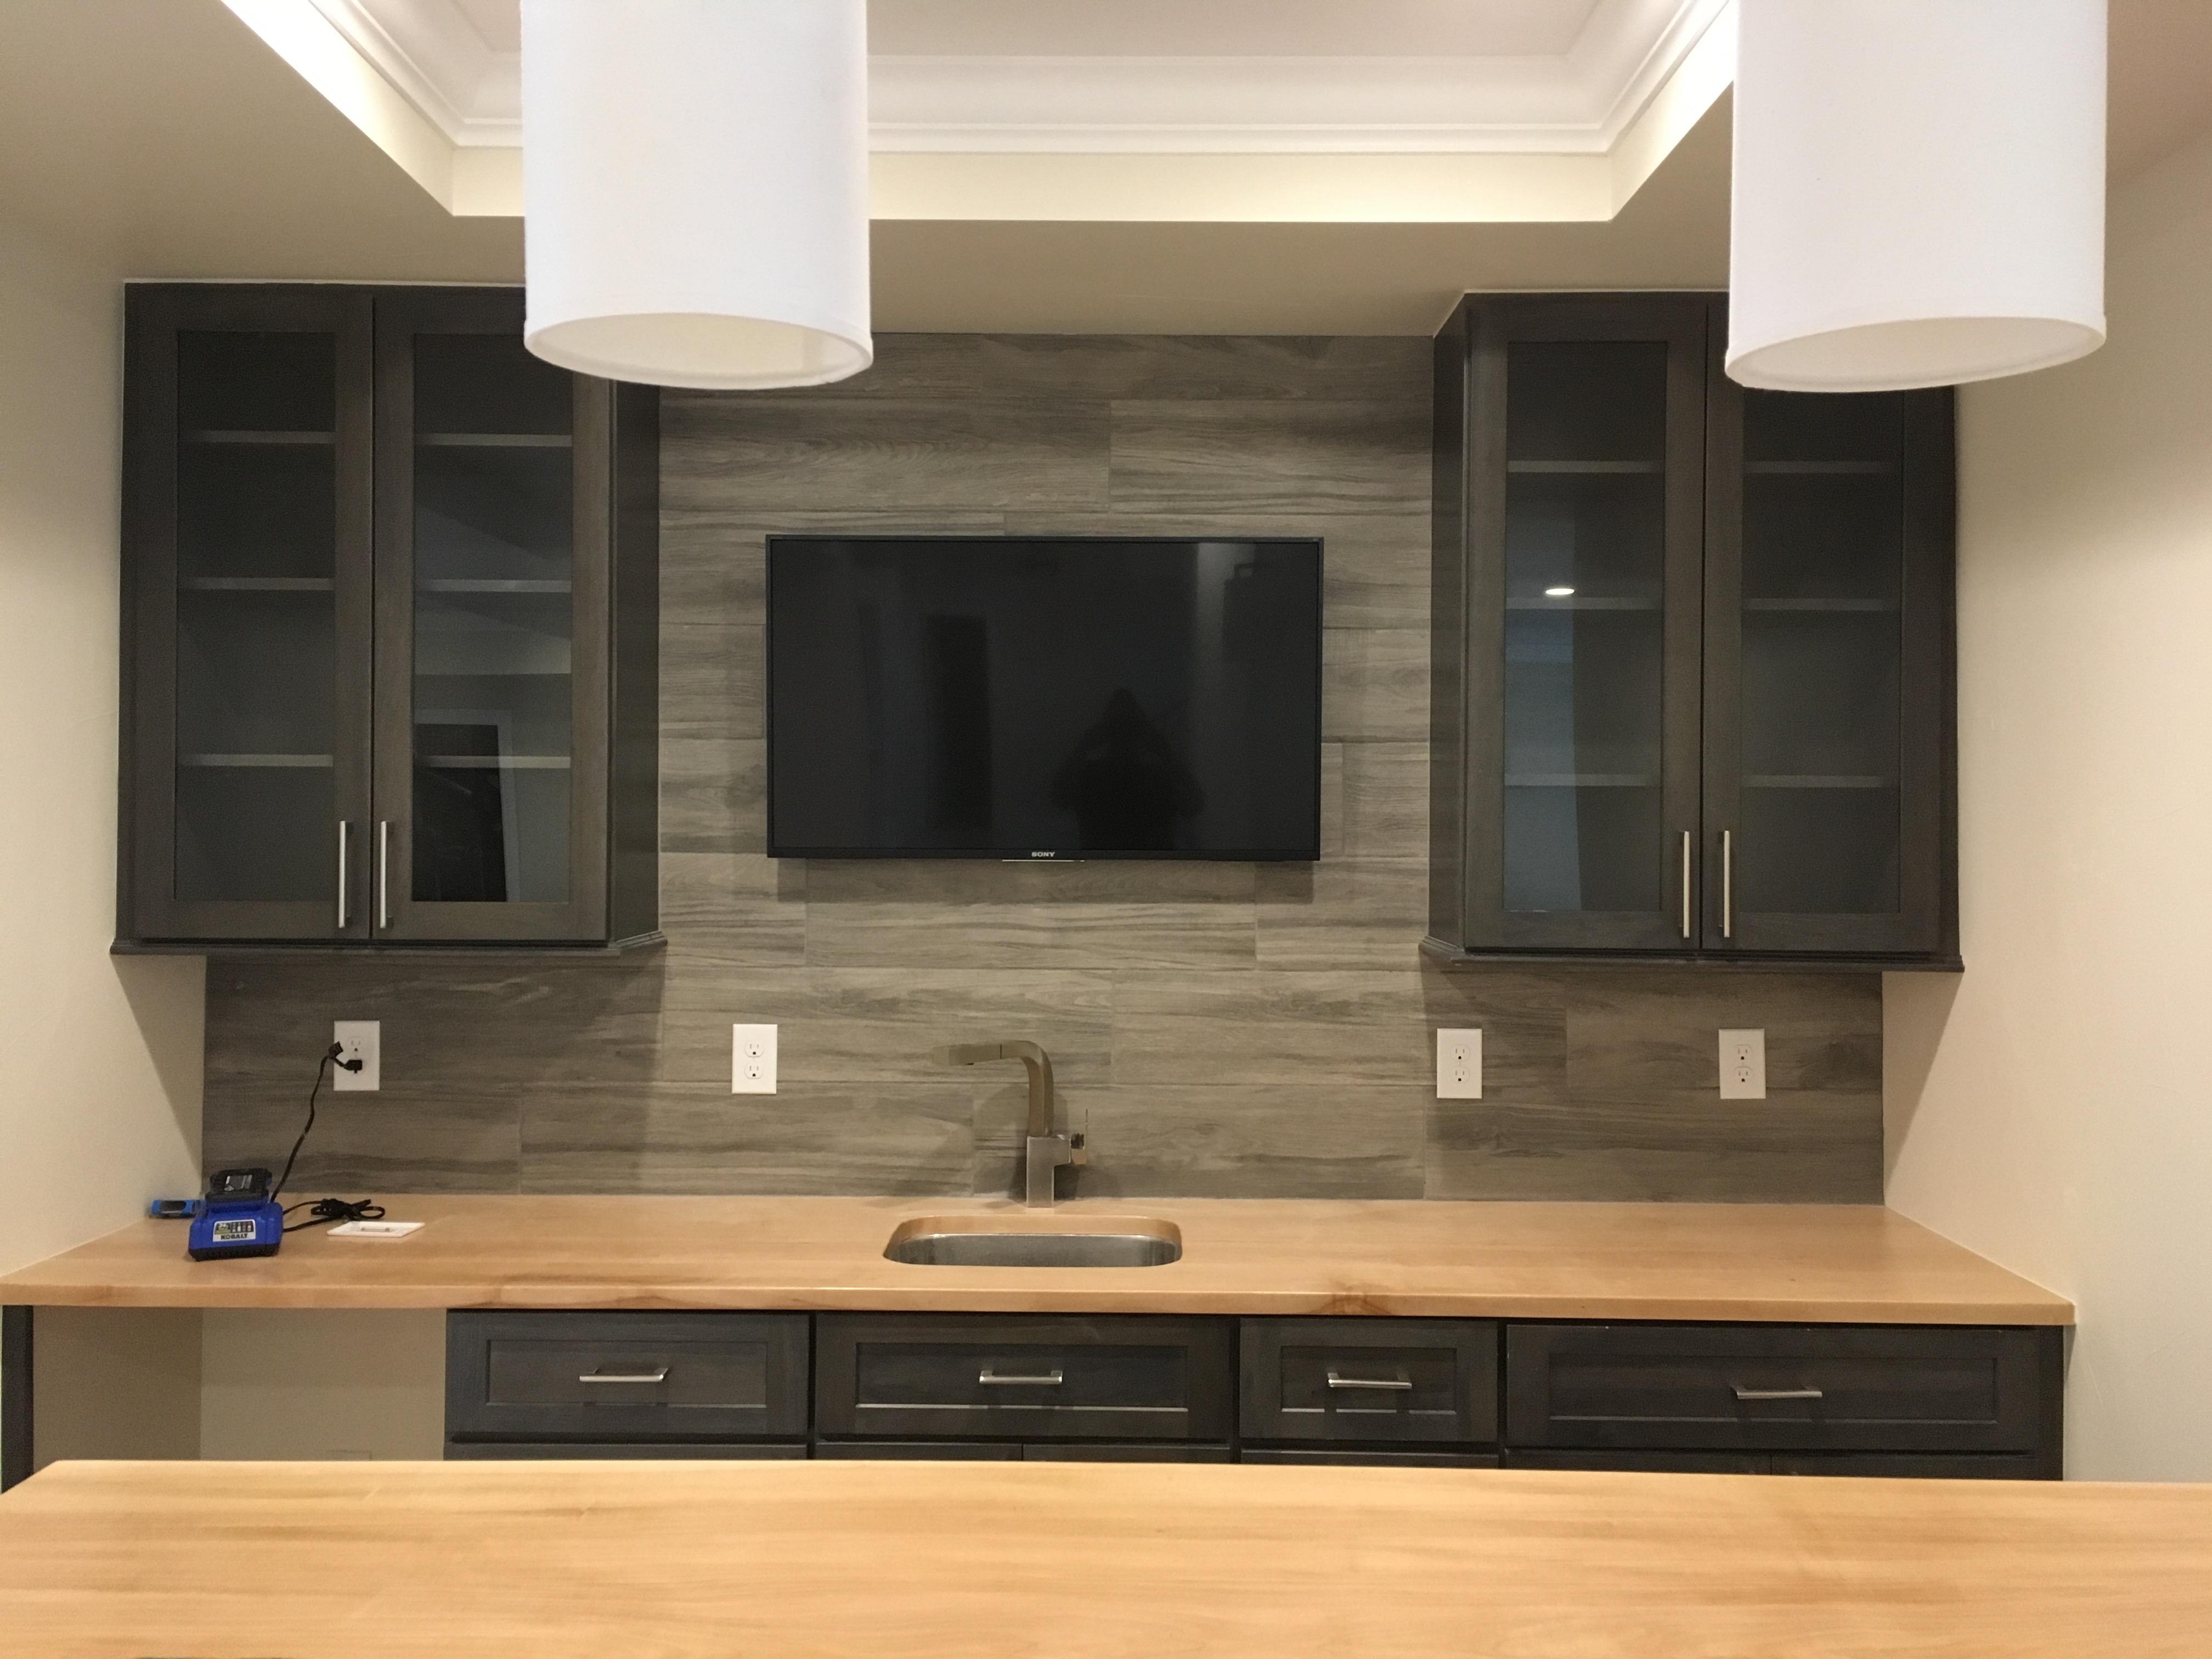 4k UHD Tv in Tile